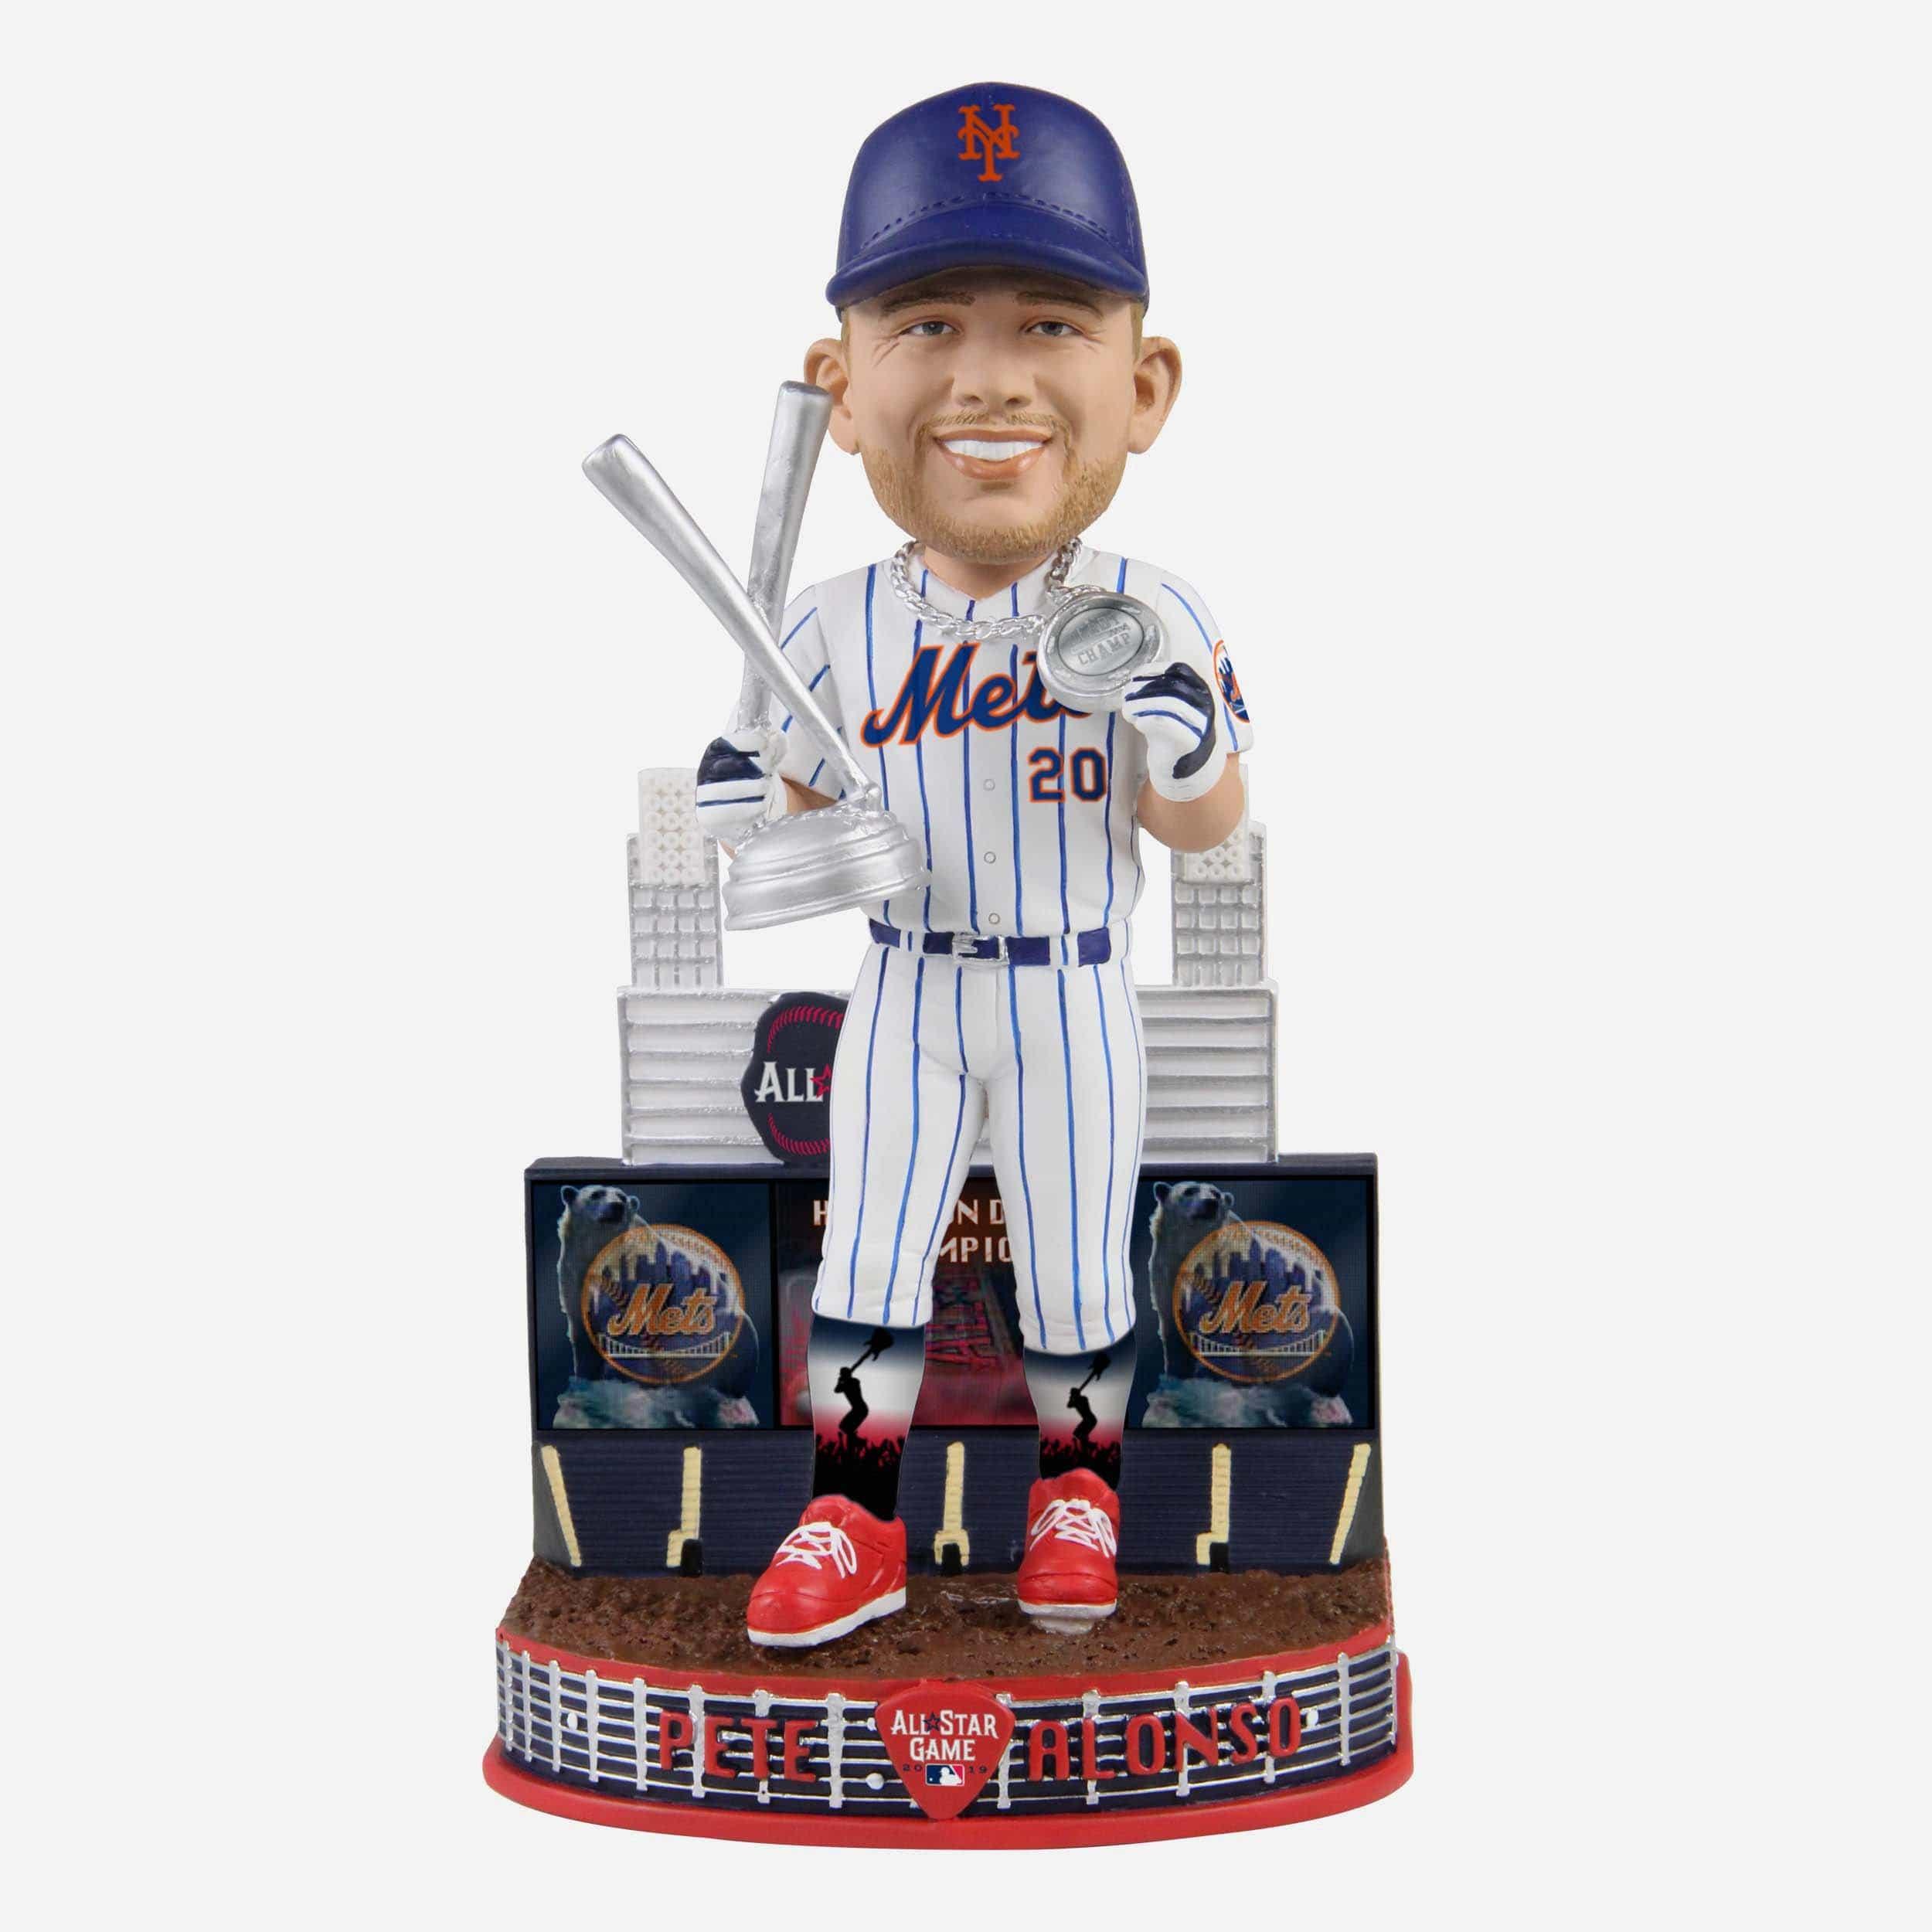 FOCO Pete Alonso New York Mets 2019 Home Run Derby Champion Bobblehead